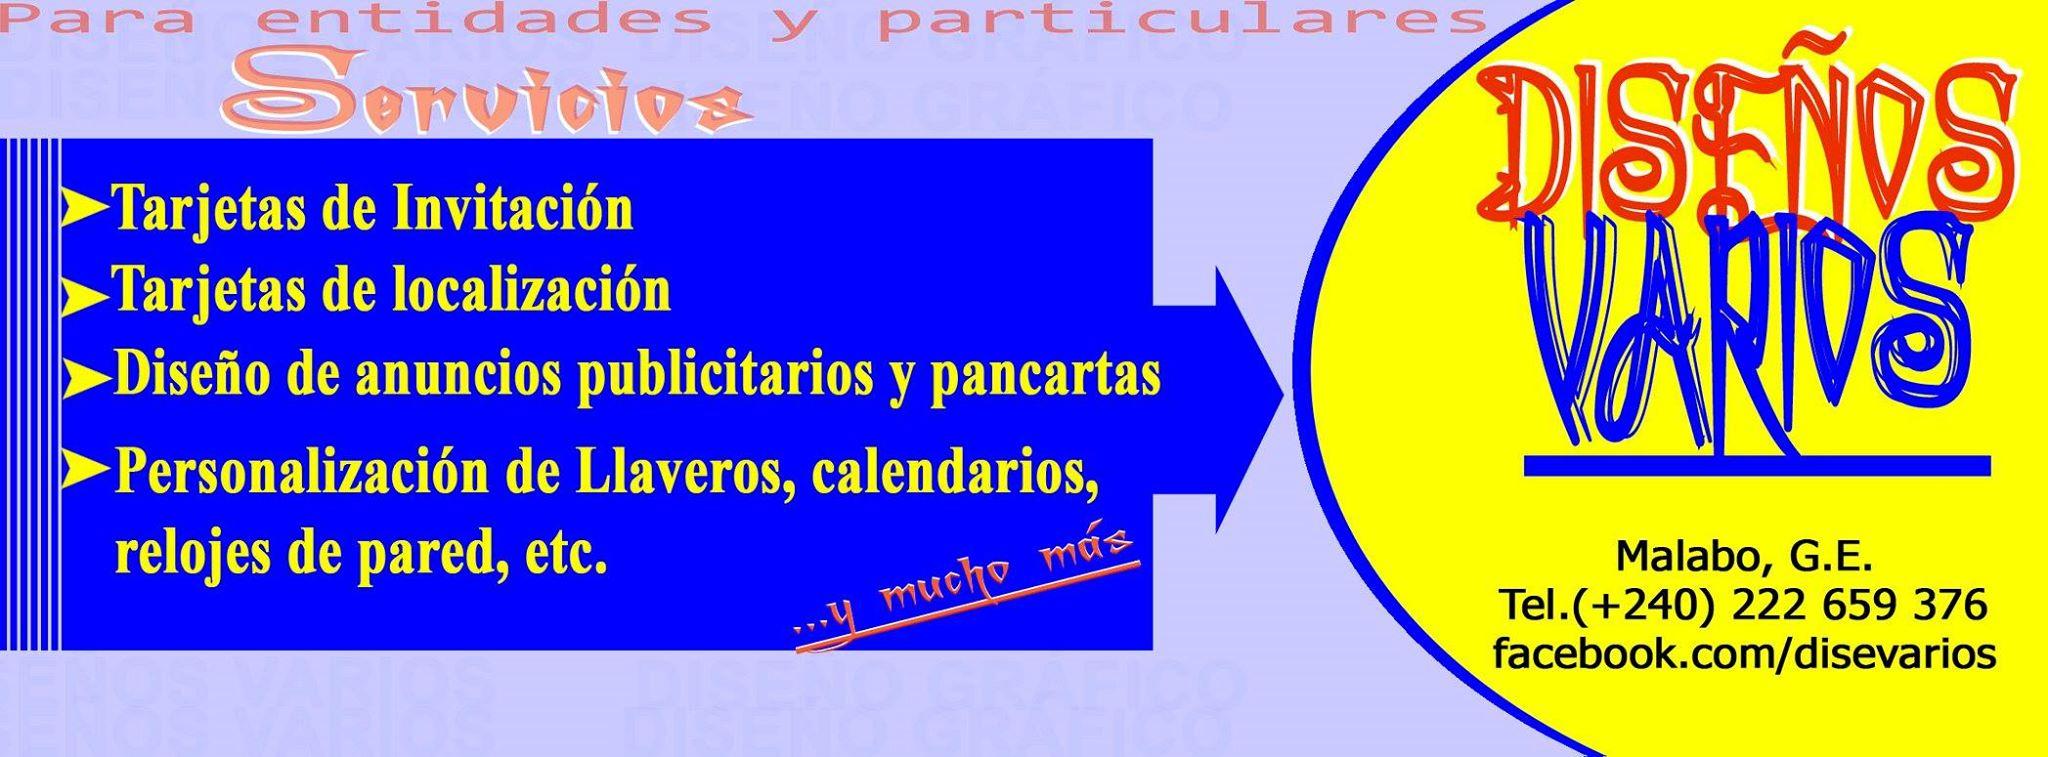 10685954_697335317020844_1328858812_o